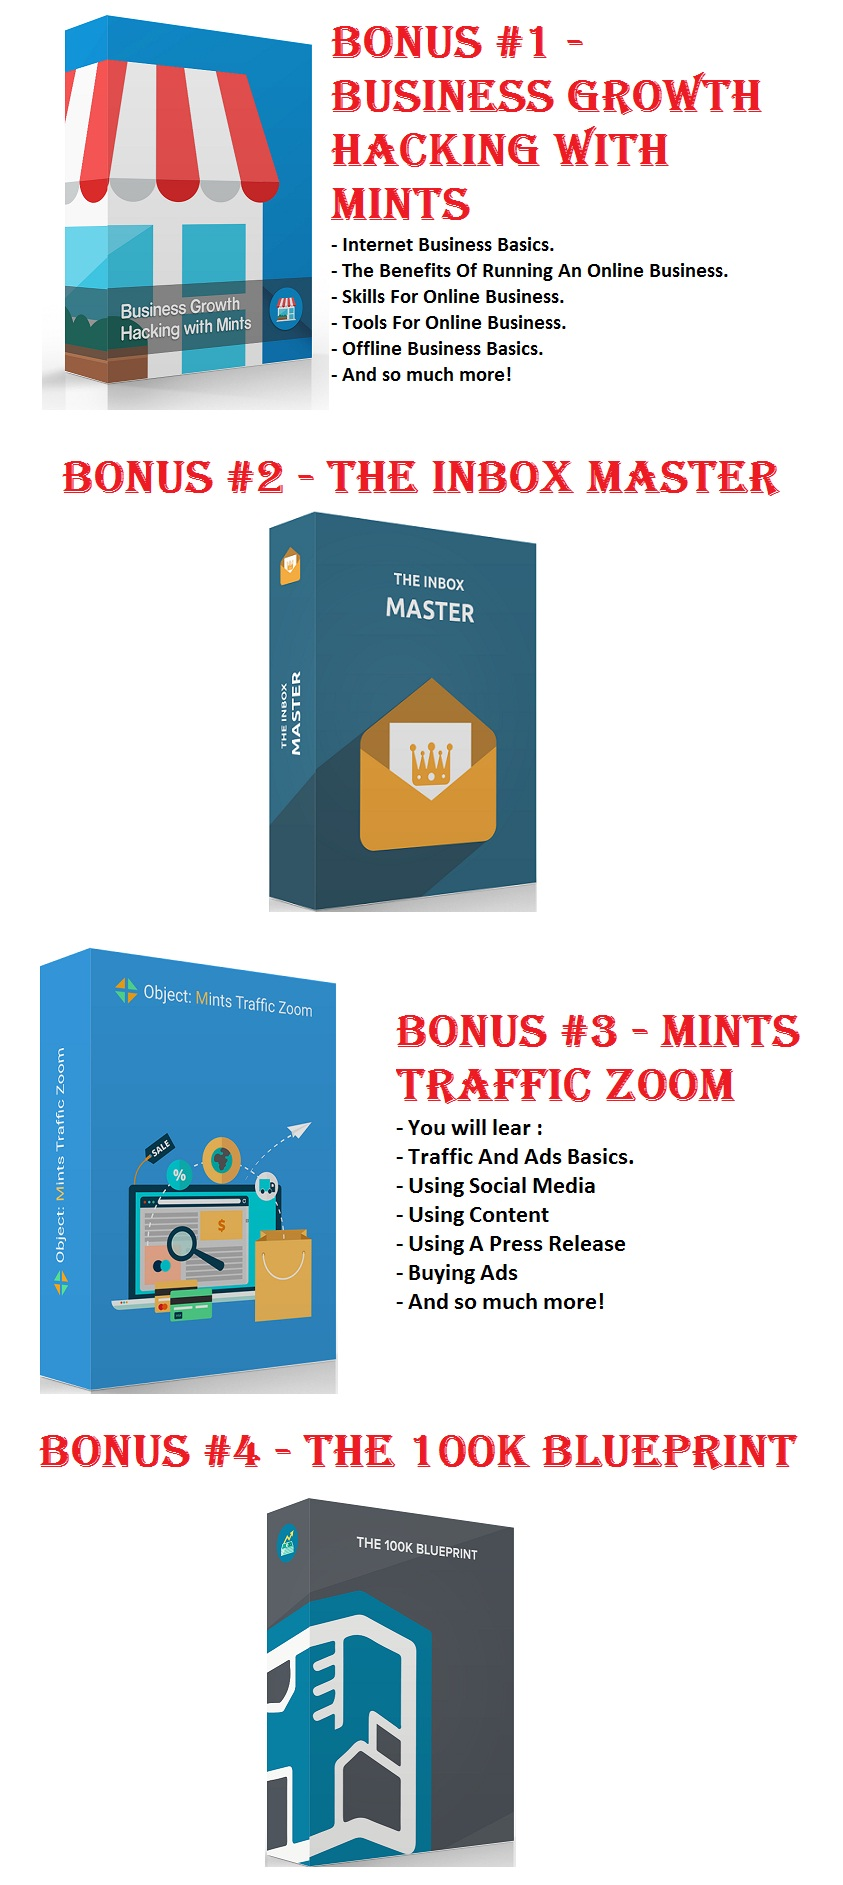 Mints App Bonuses